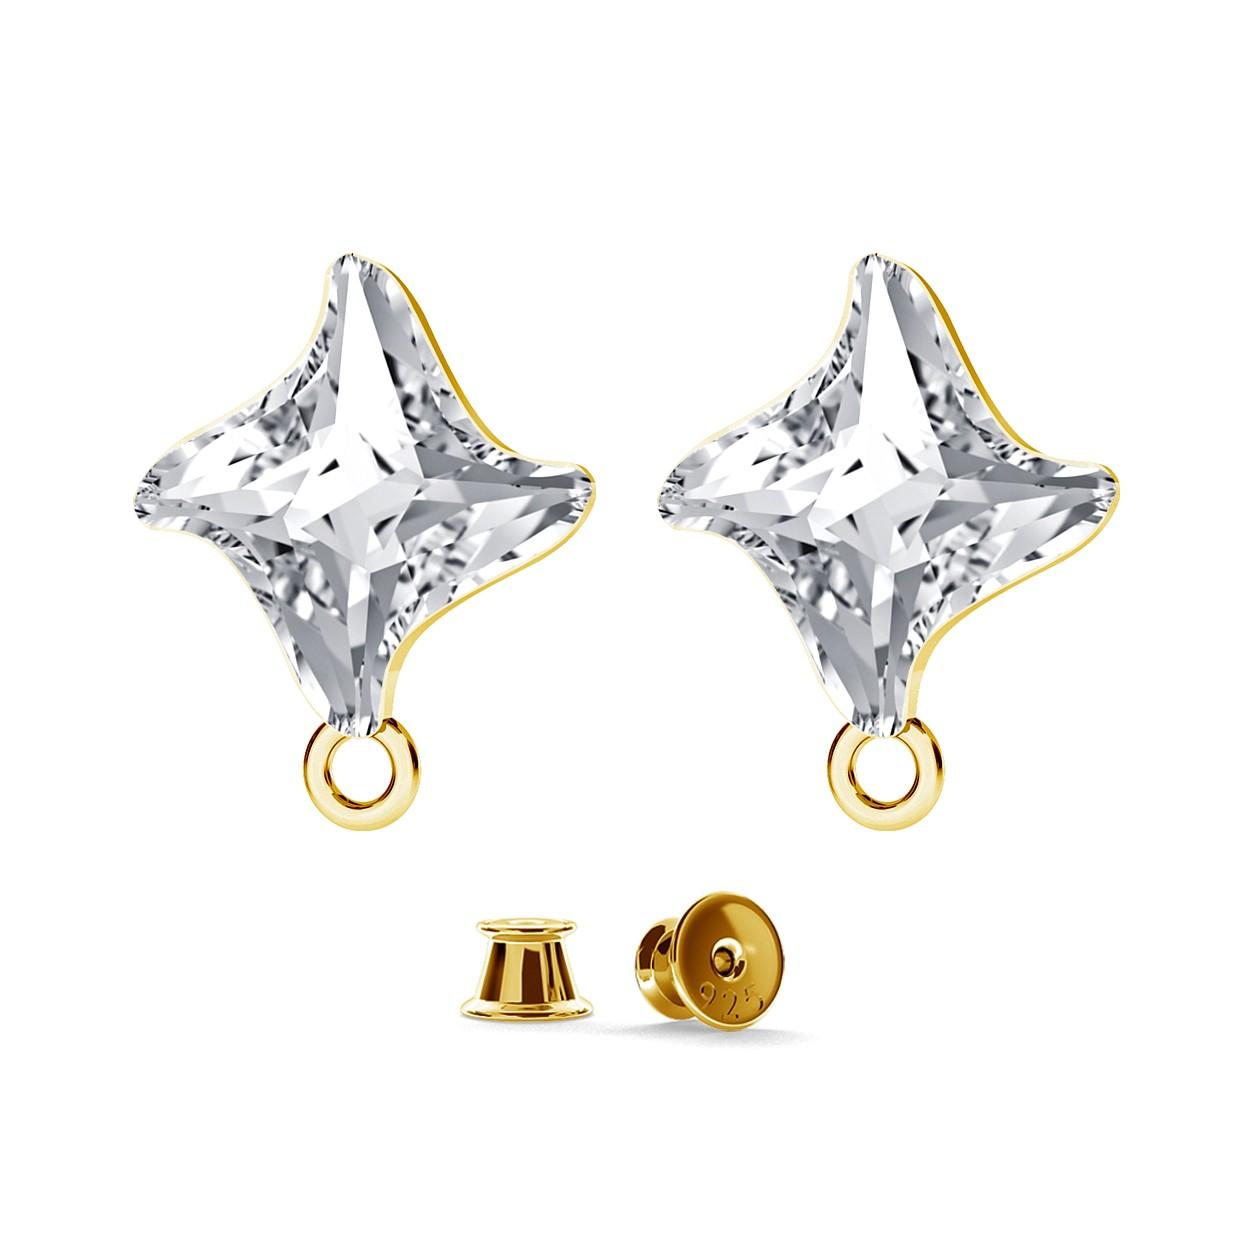 Earrings swarovski twist charms base